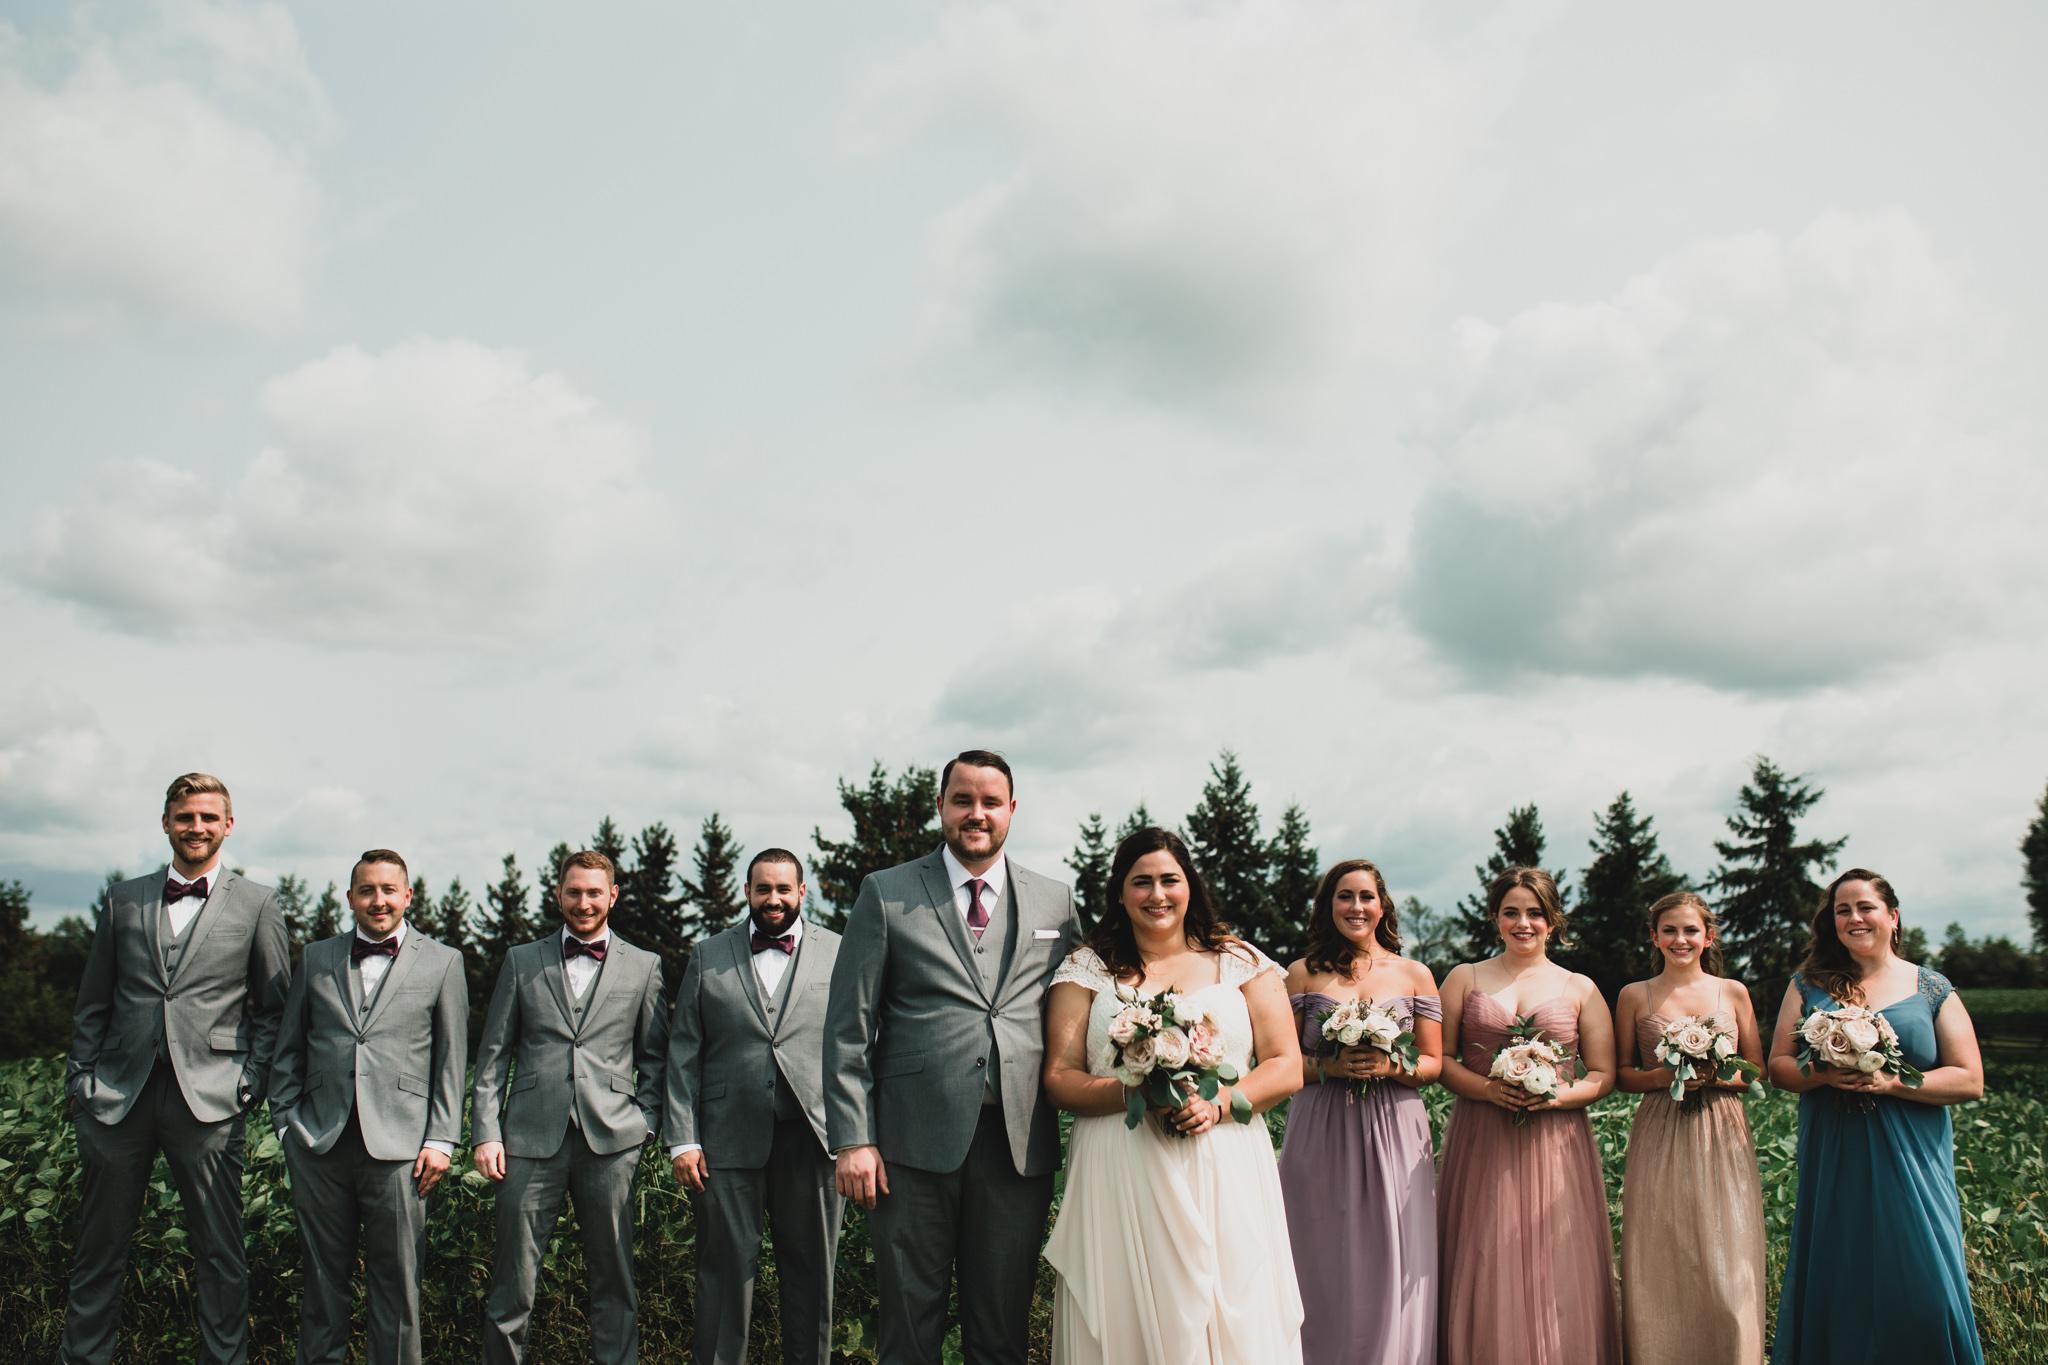 Mixed coloured dresses, bridesmaids